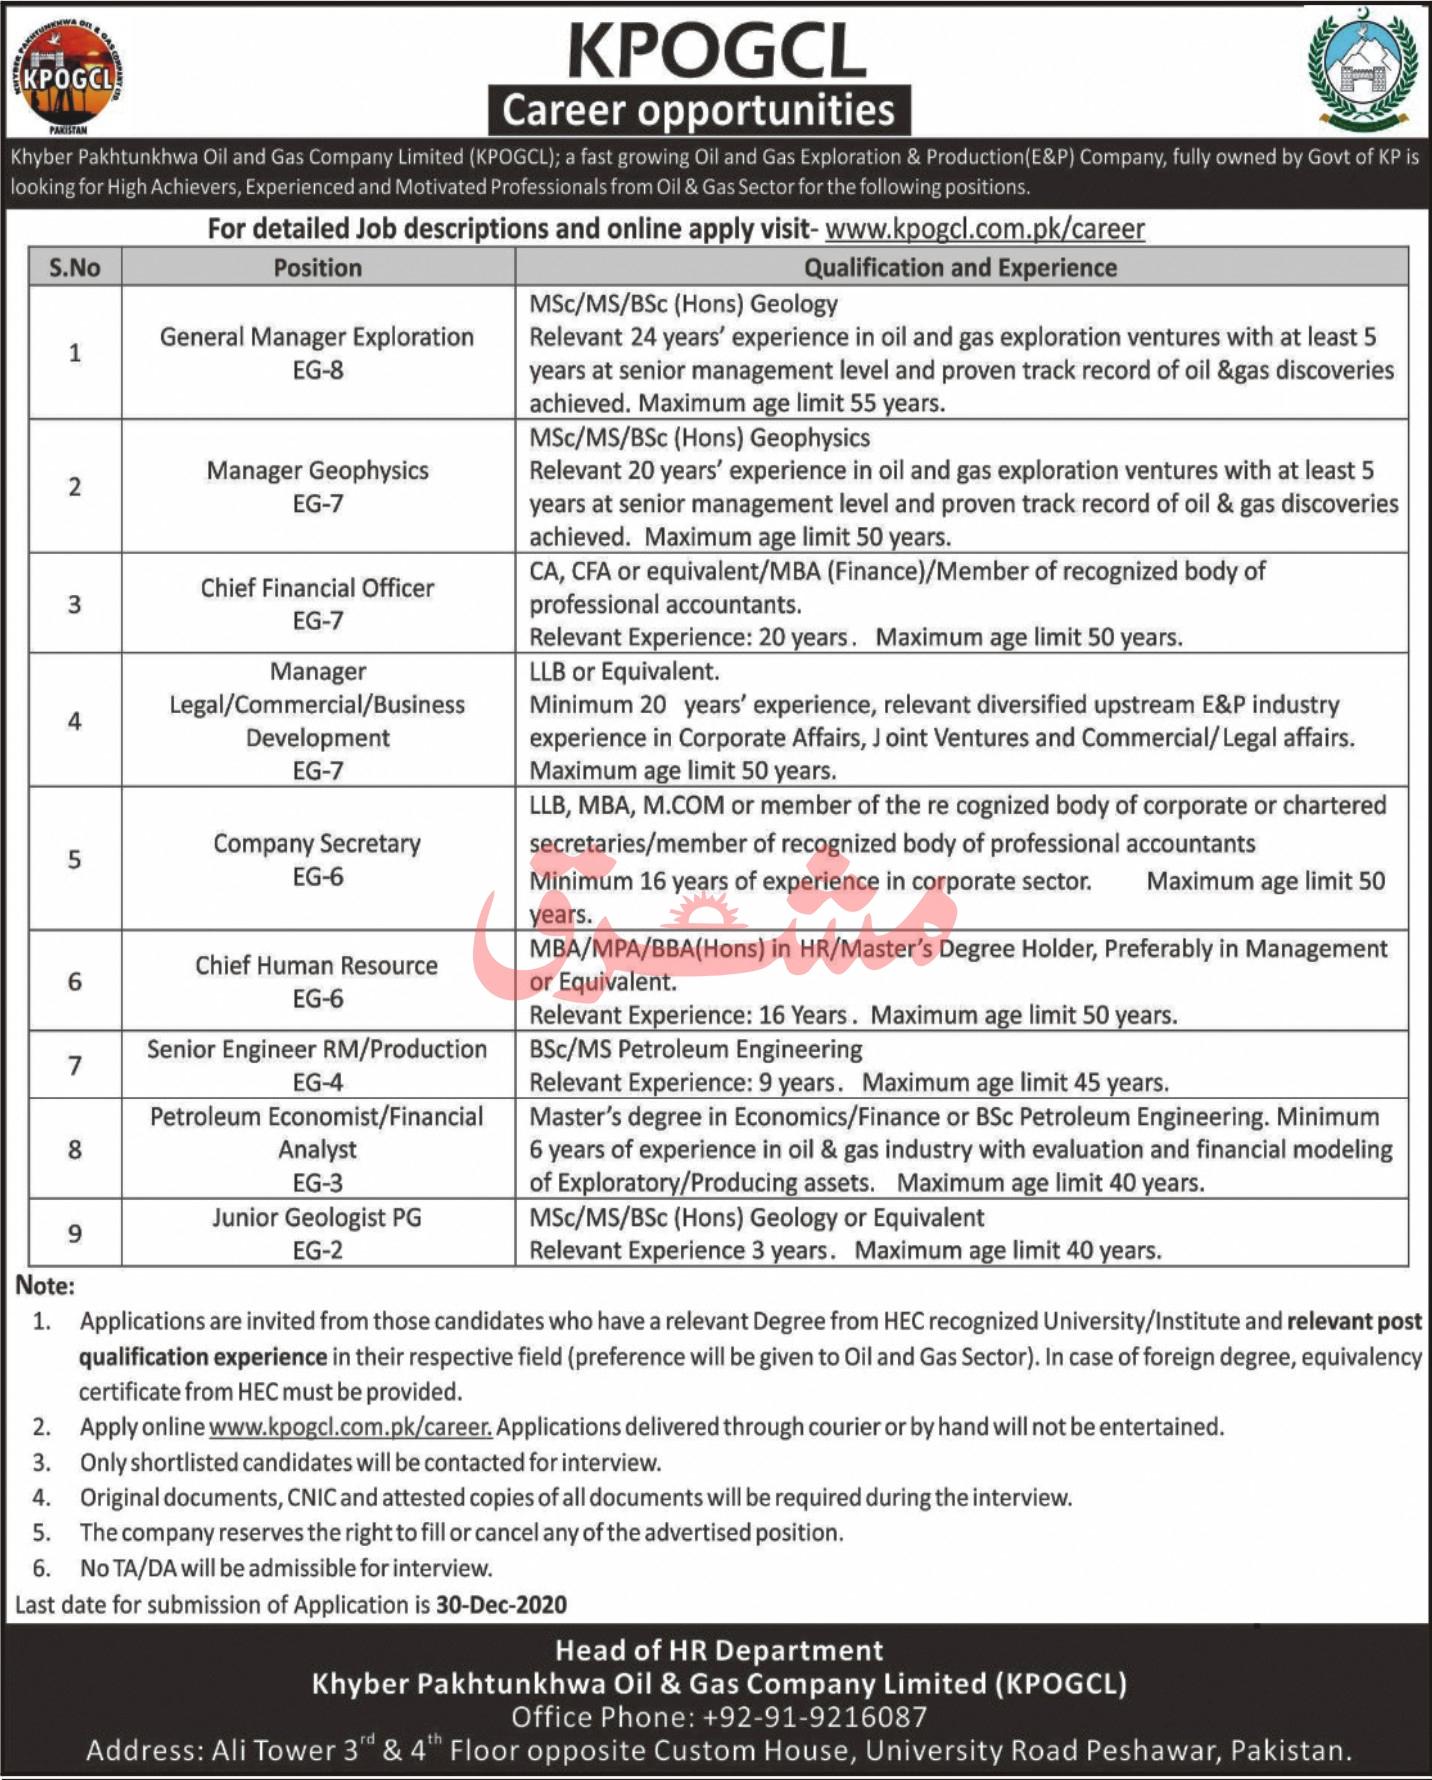 KPOGCL Jobs December 2020